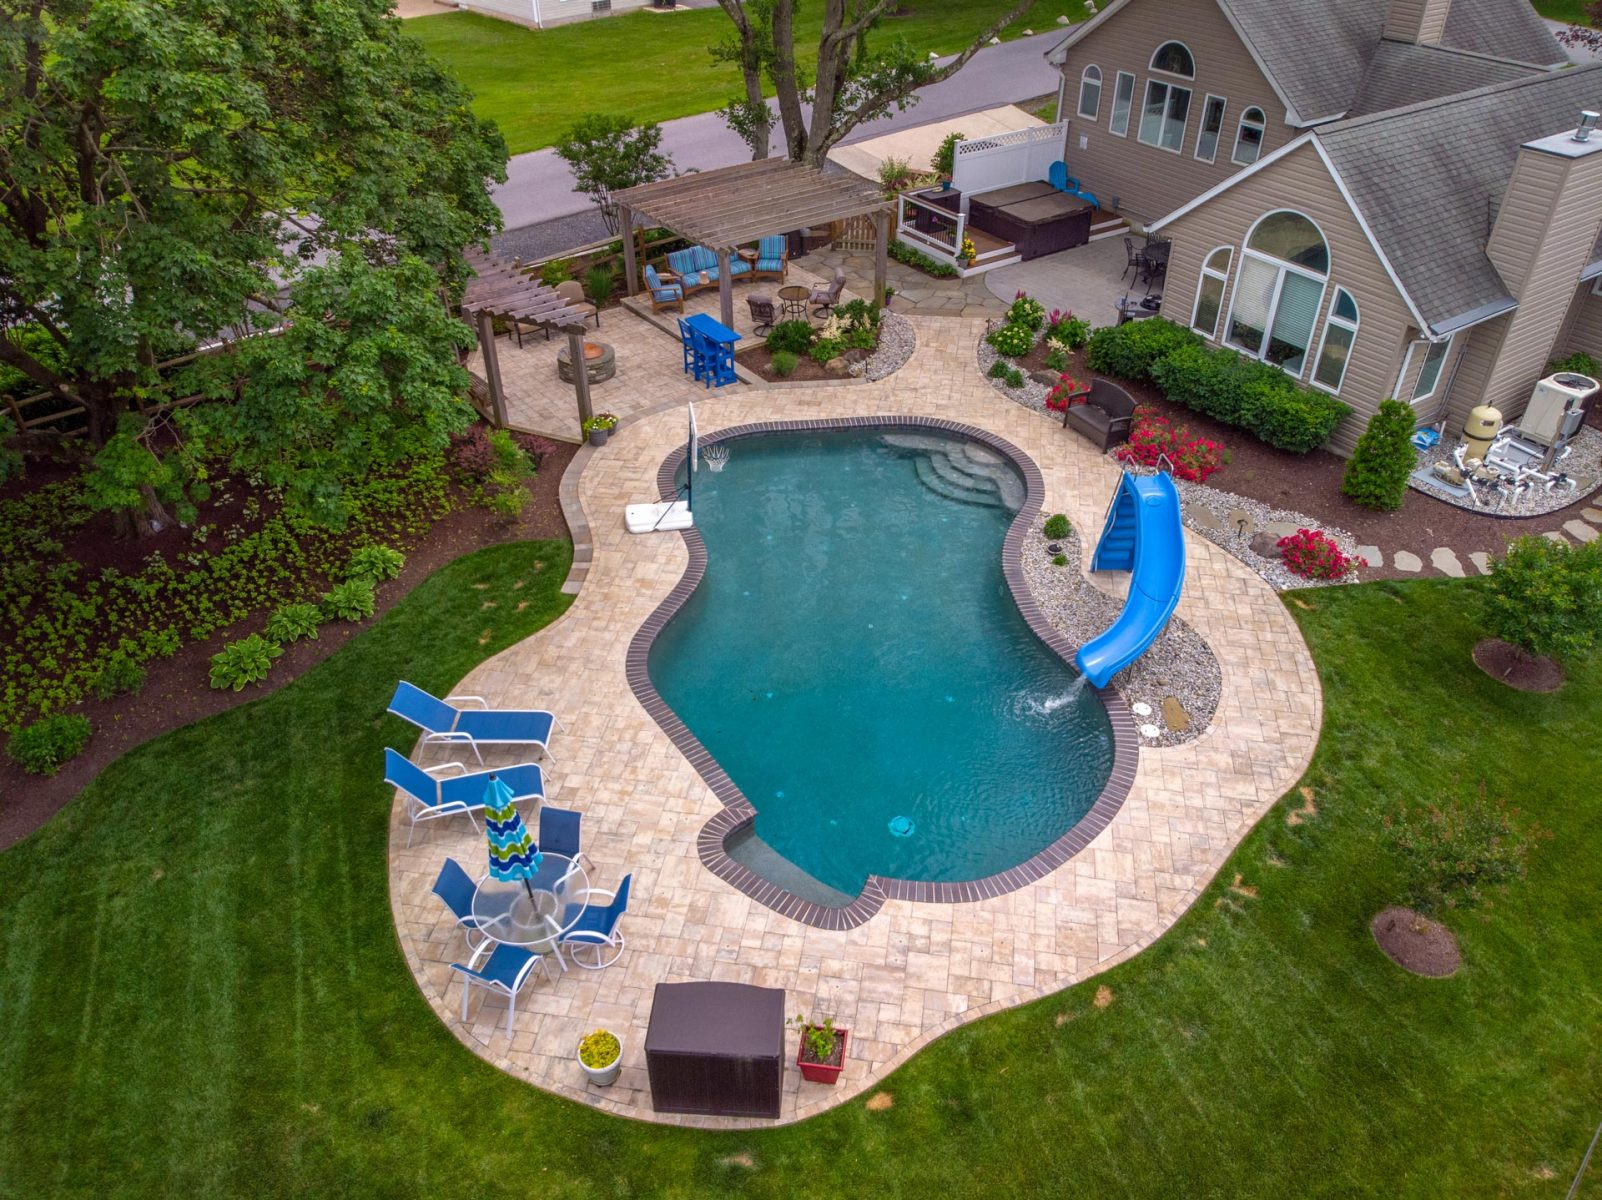 Outdoor Patio Design in Sykesville, MD